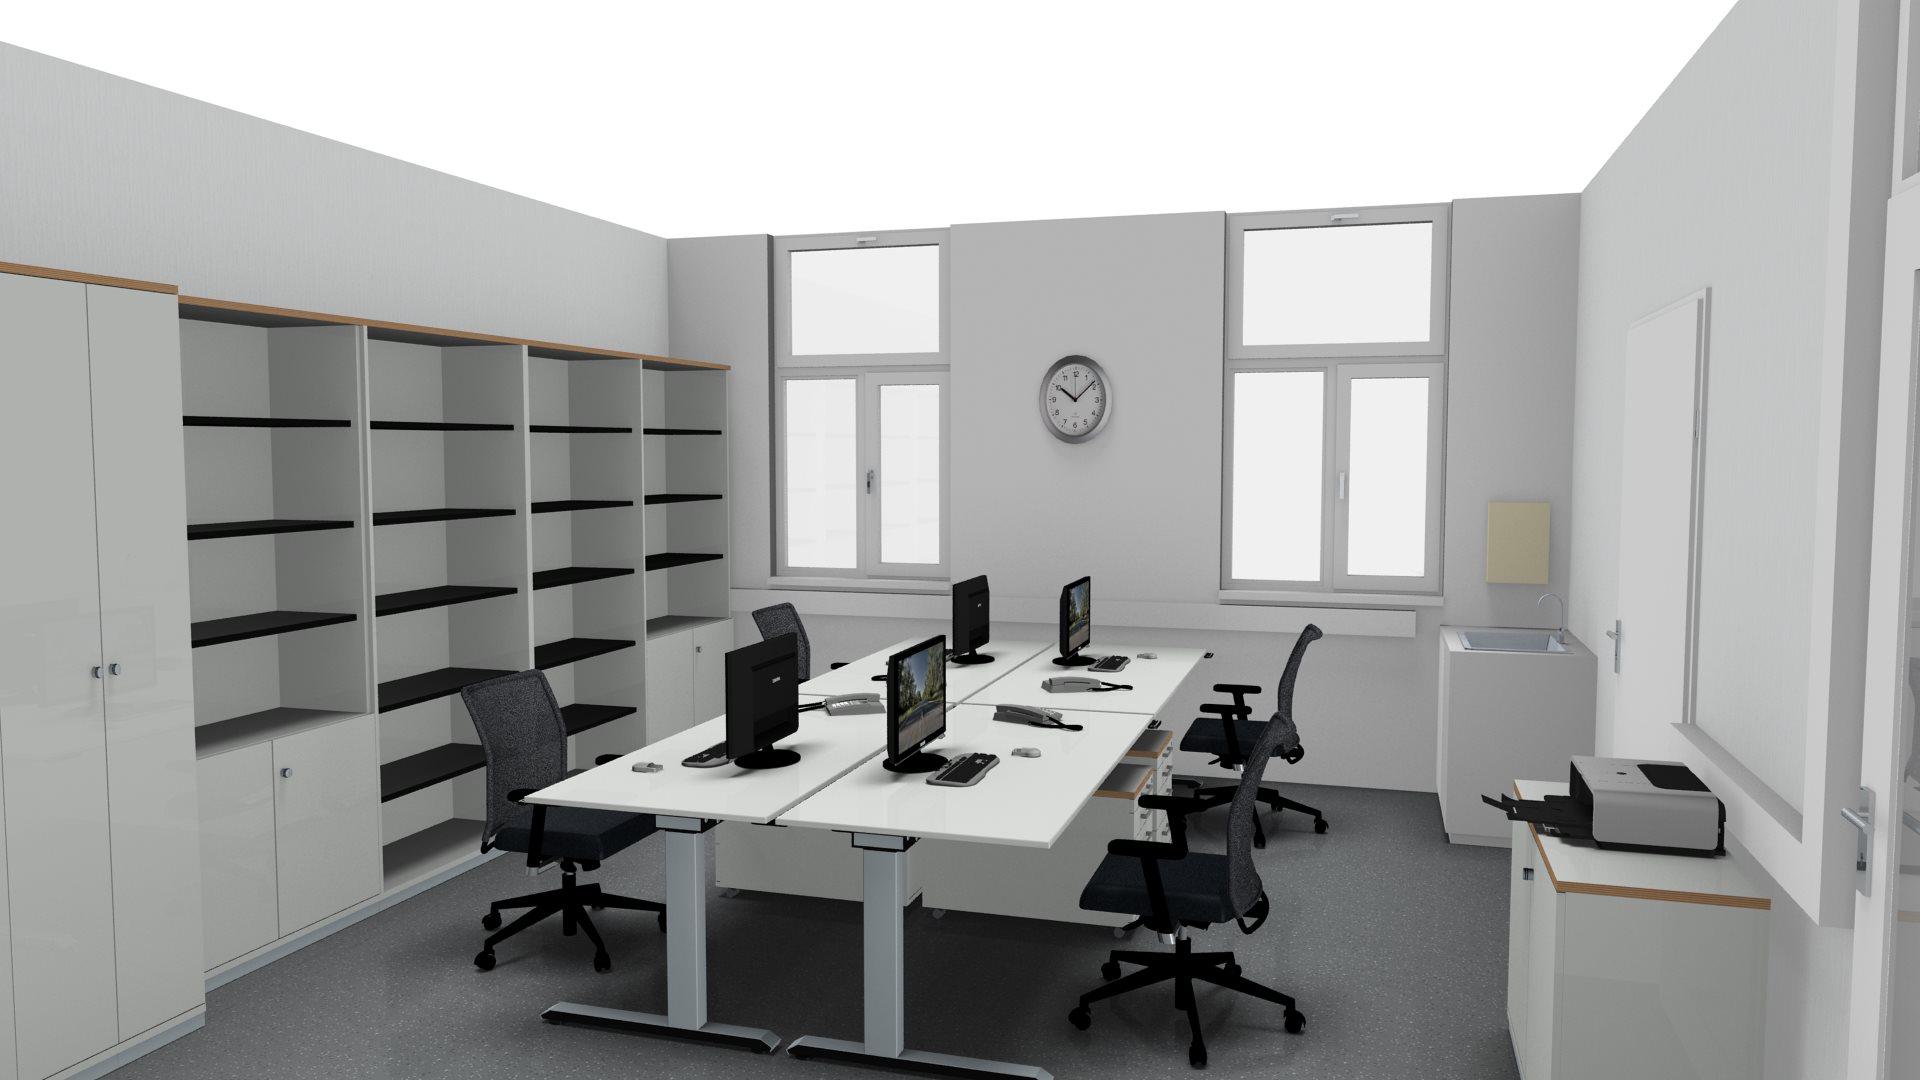 actica gmbh actica planen einrichten 3d planung b roeinrichtung. Black Bedroom Furniture Sets. Home Design Ideas